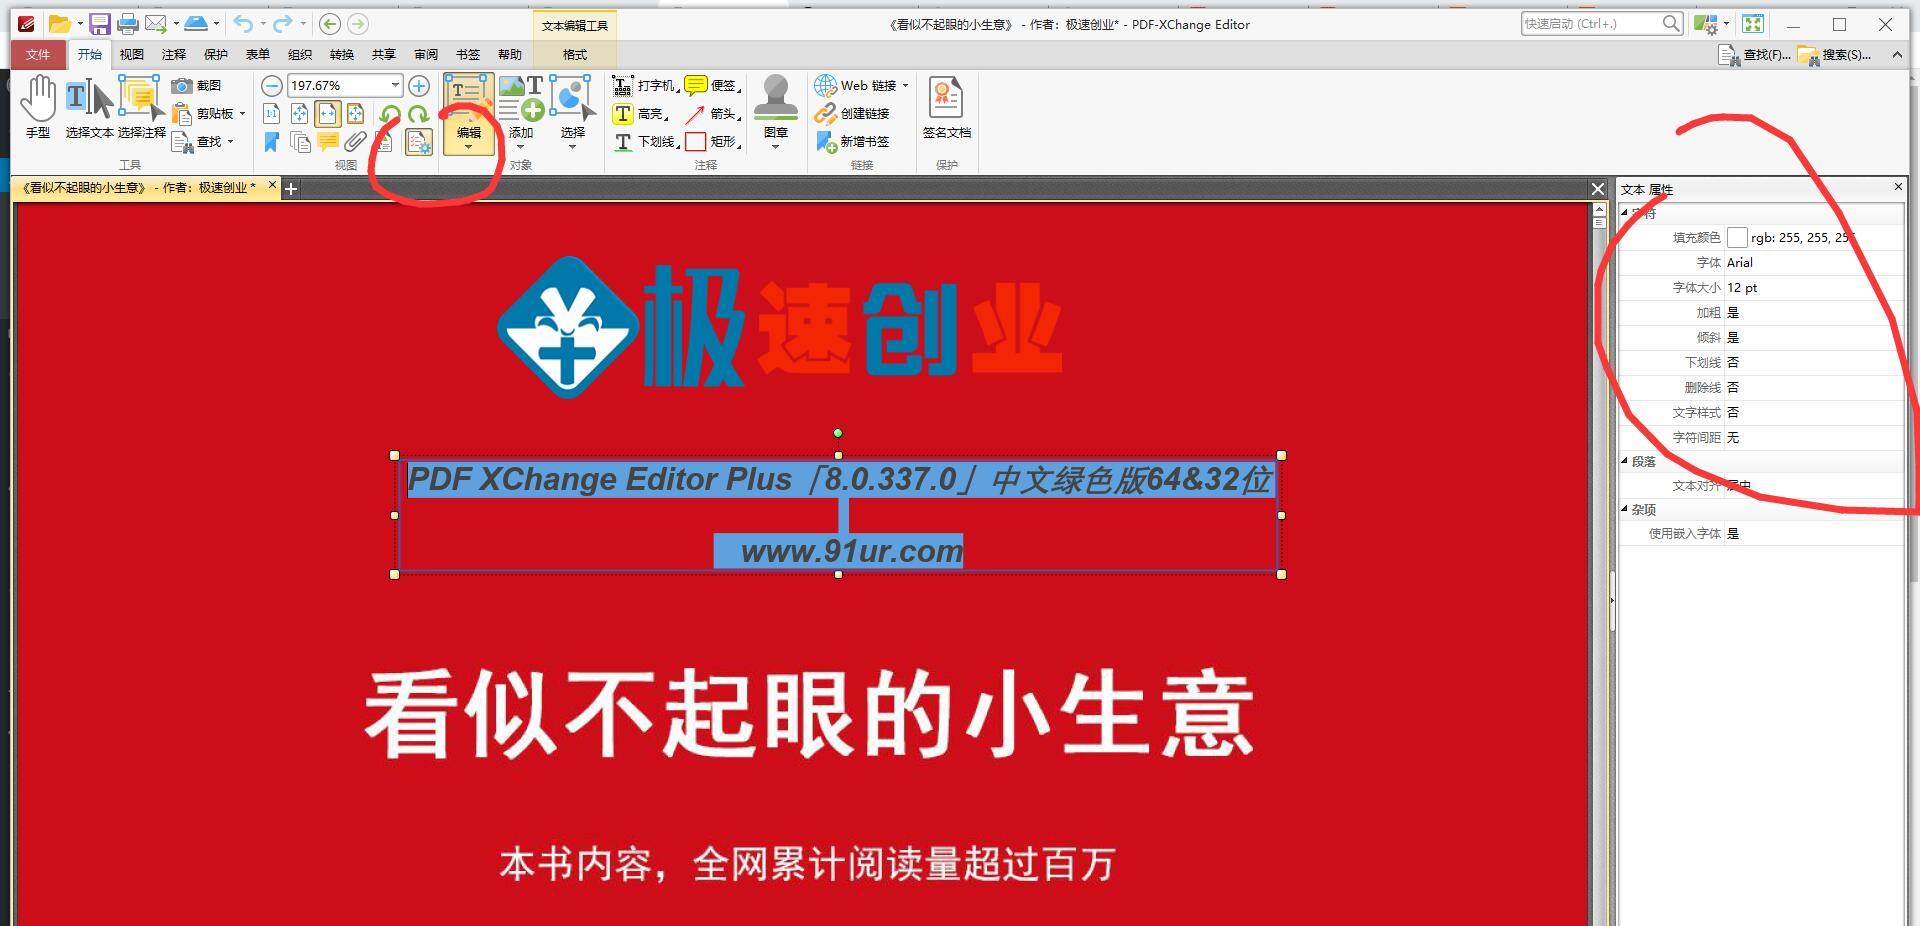 PDF电子书编辑查看软件#PDF XChange Editor Plus「8.0.337.0」中文绿色版64&32位